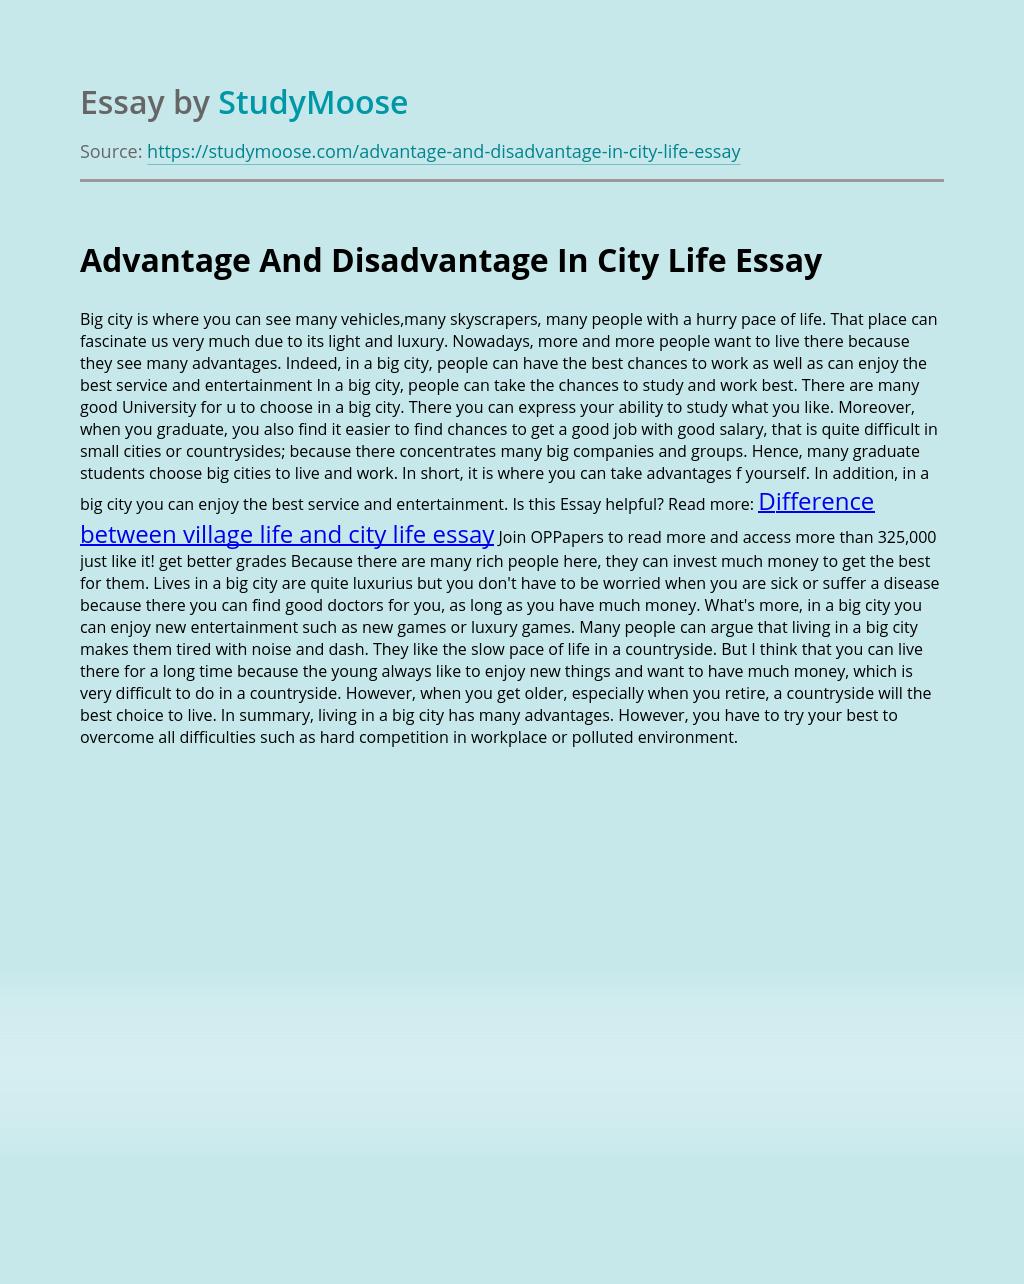 Advantage And Disadvantage In City Life